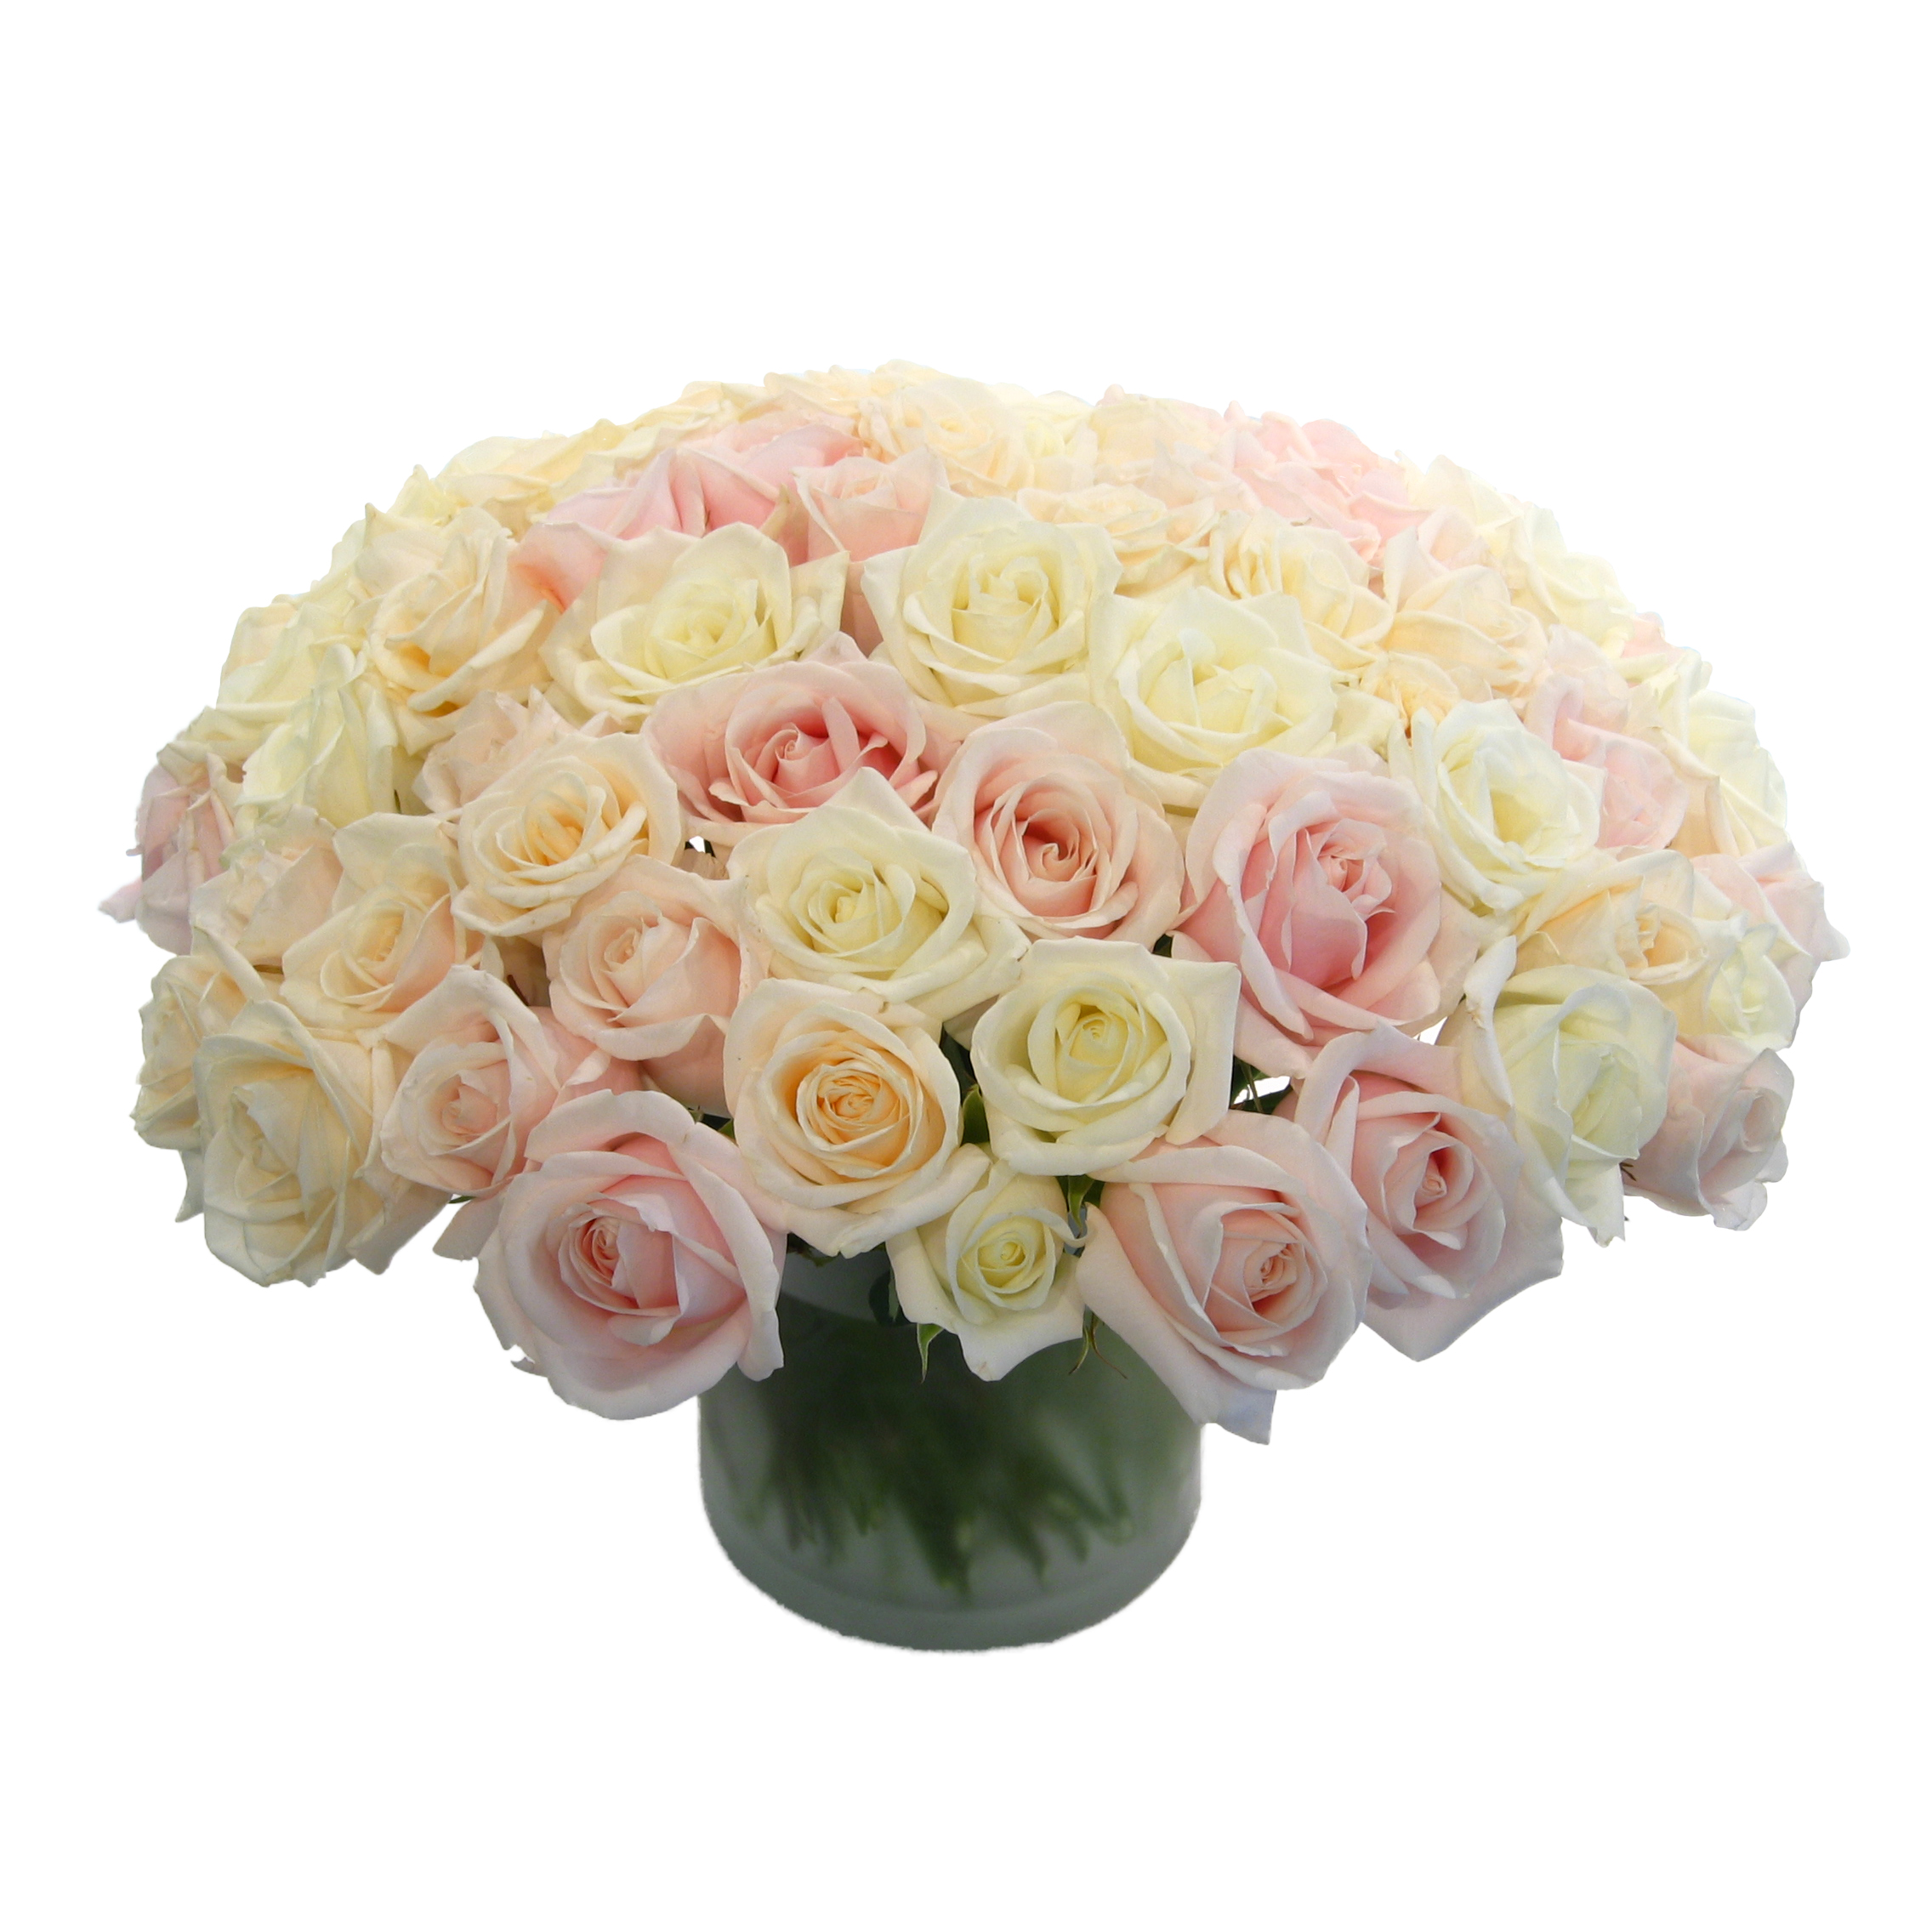 Peaches and Cream Rose Composition